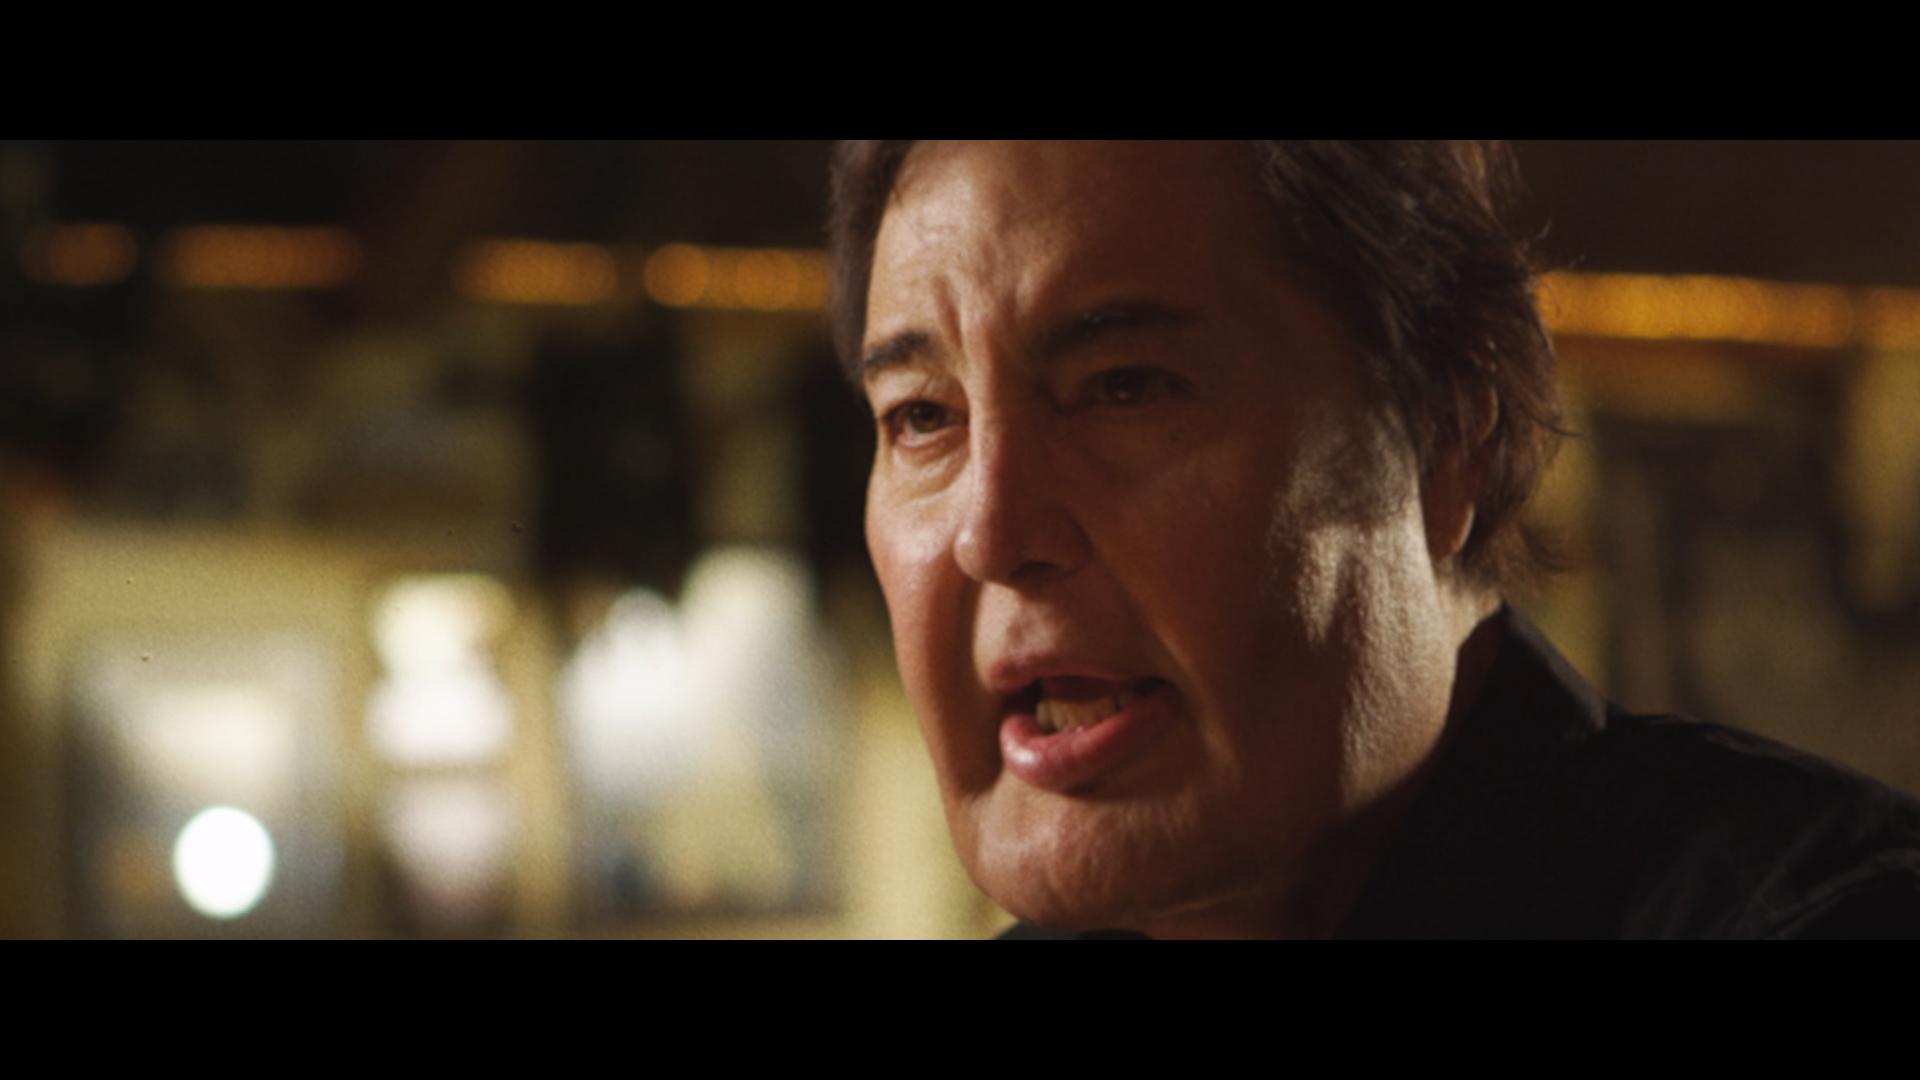 """High on the Hog lights up theatres worldwide"" - -Haddonfield Horror"